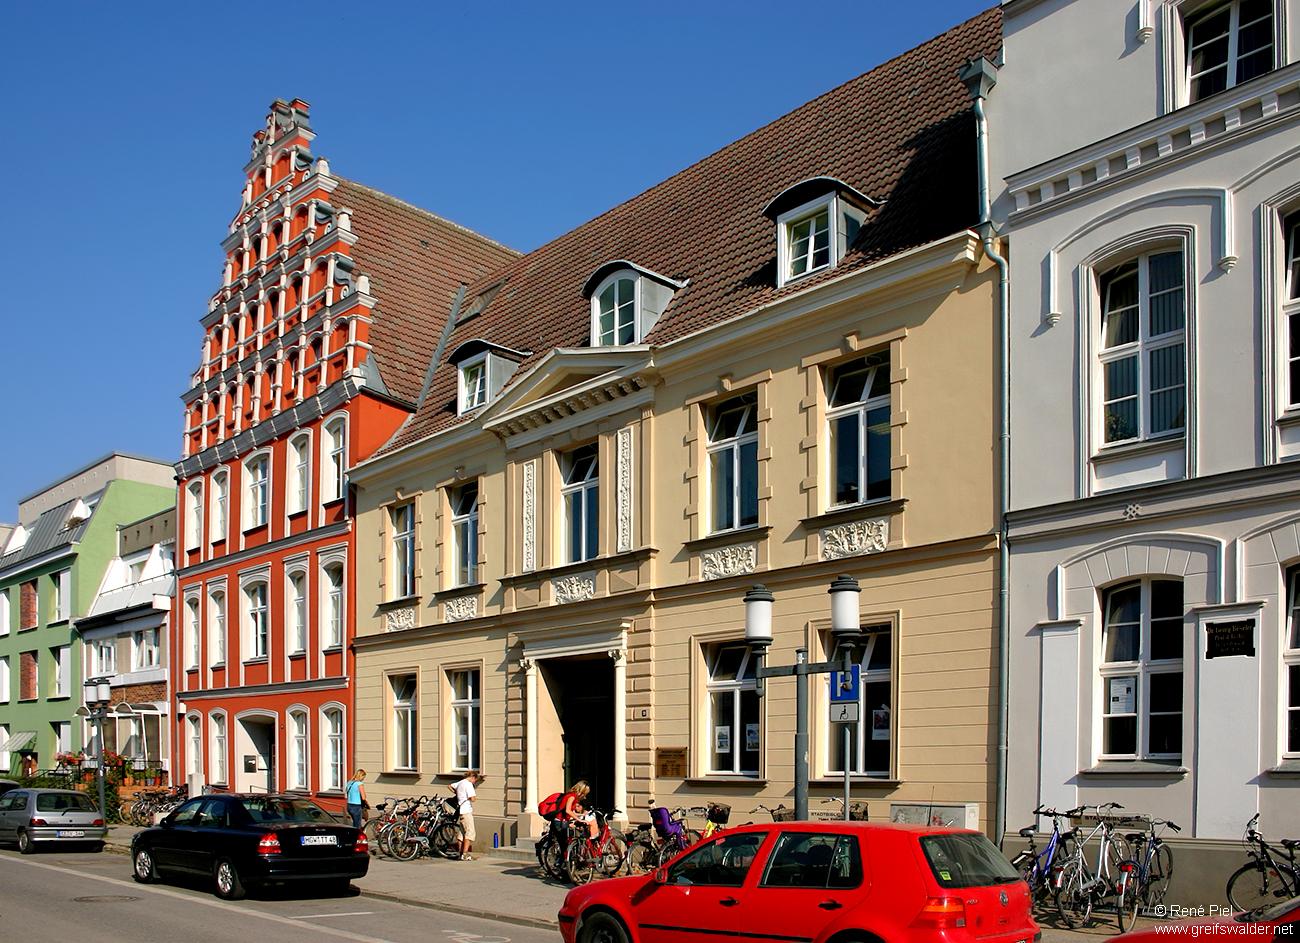 Stadtbibliothek Hans Fallada in Greifswald